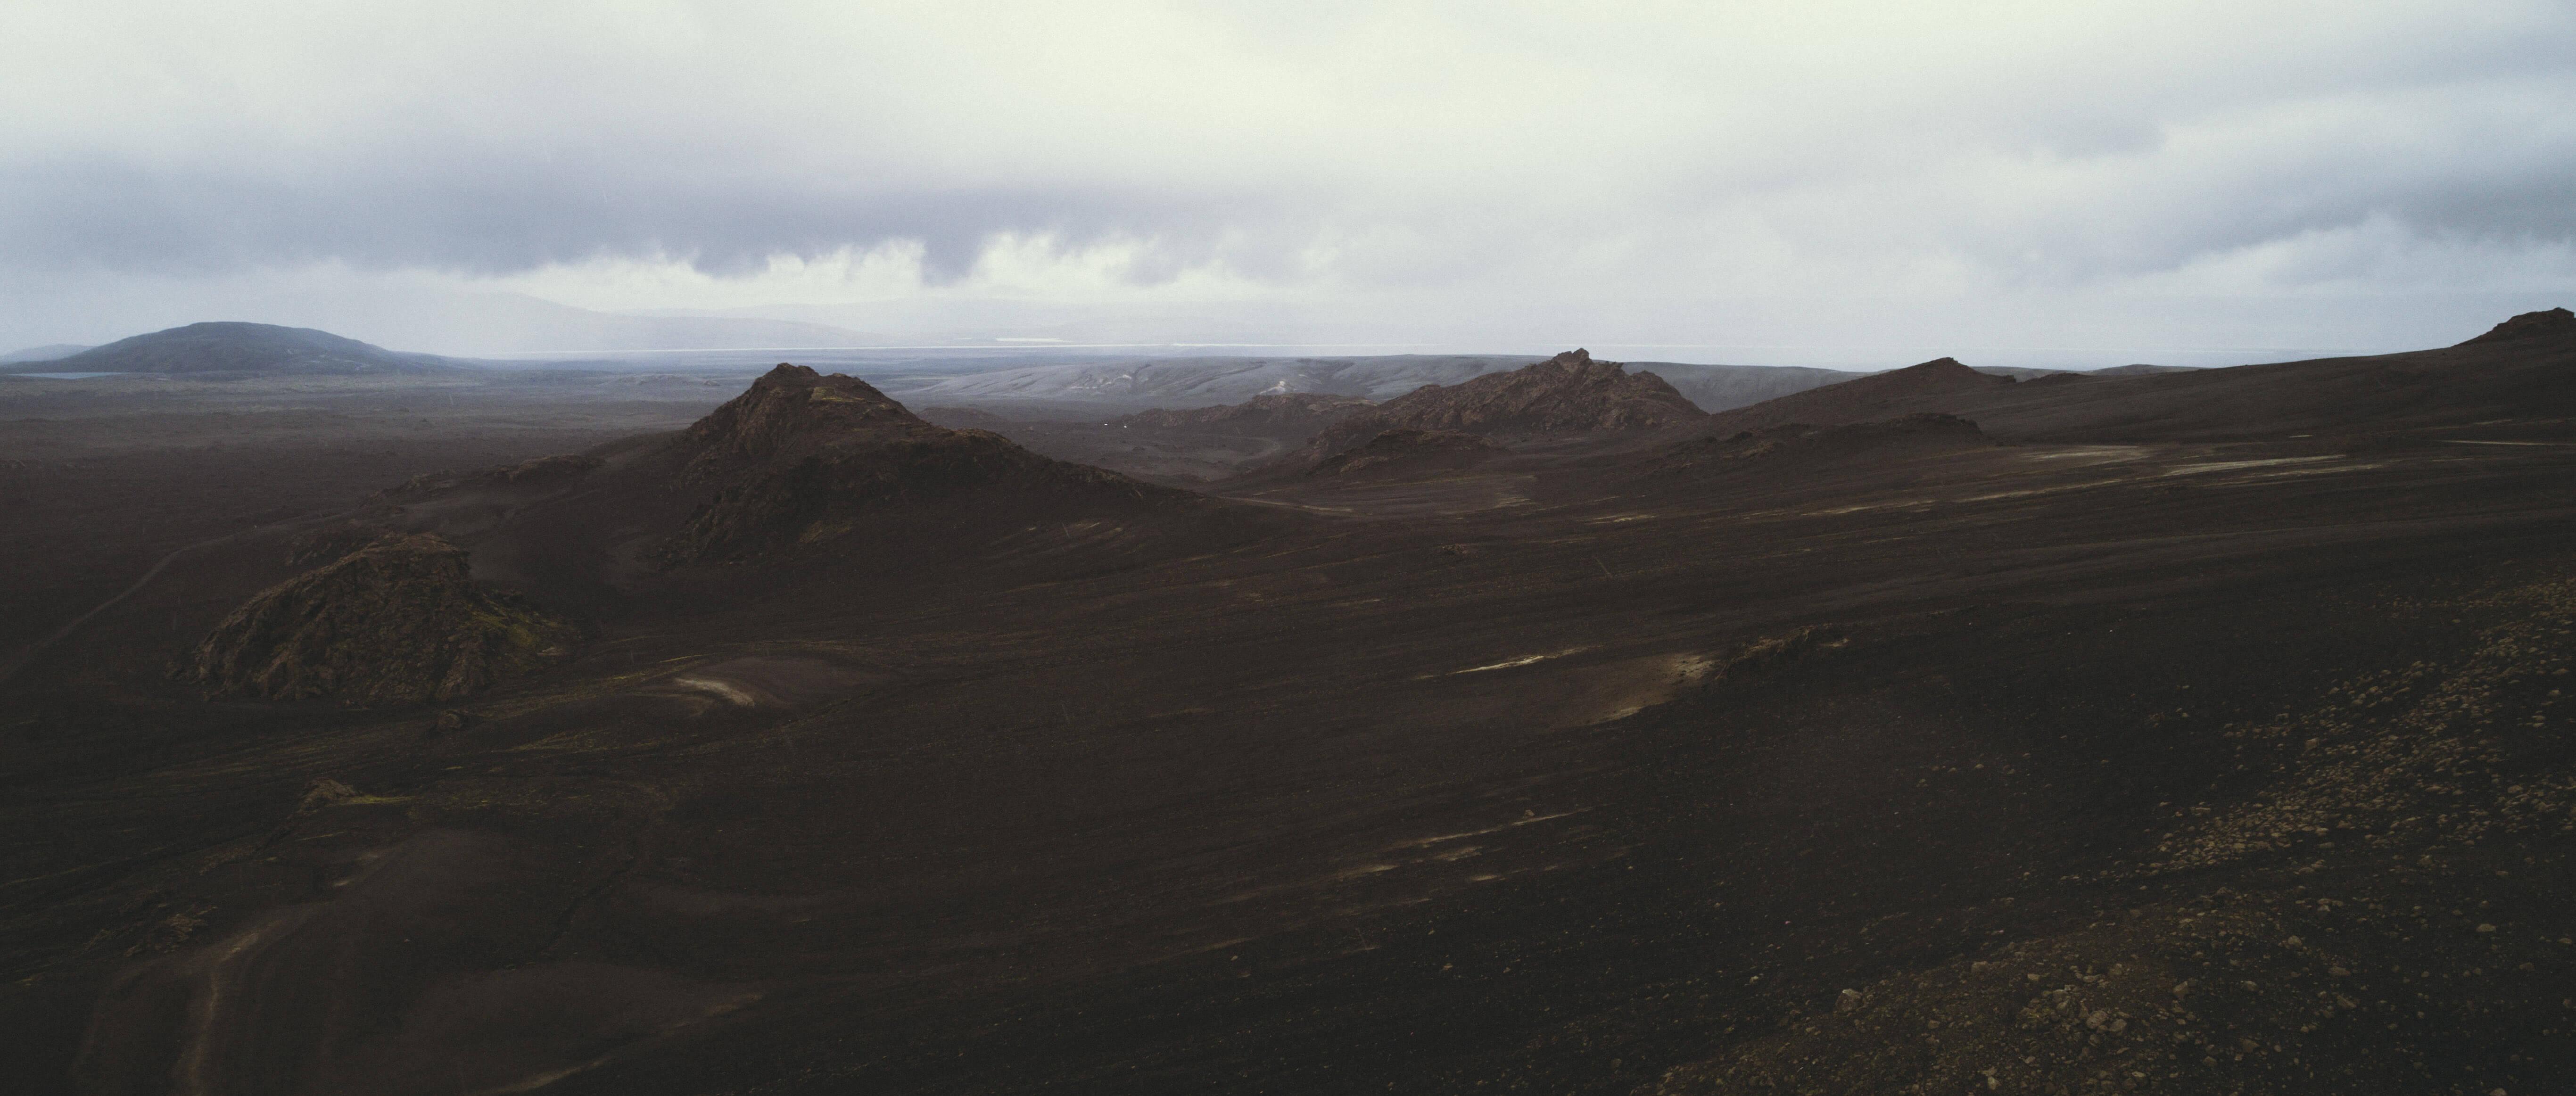 Nissan_Islande-19